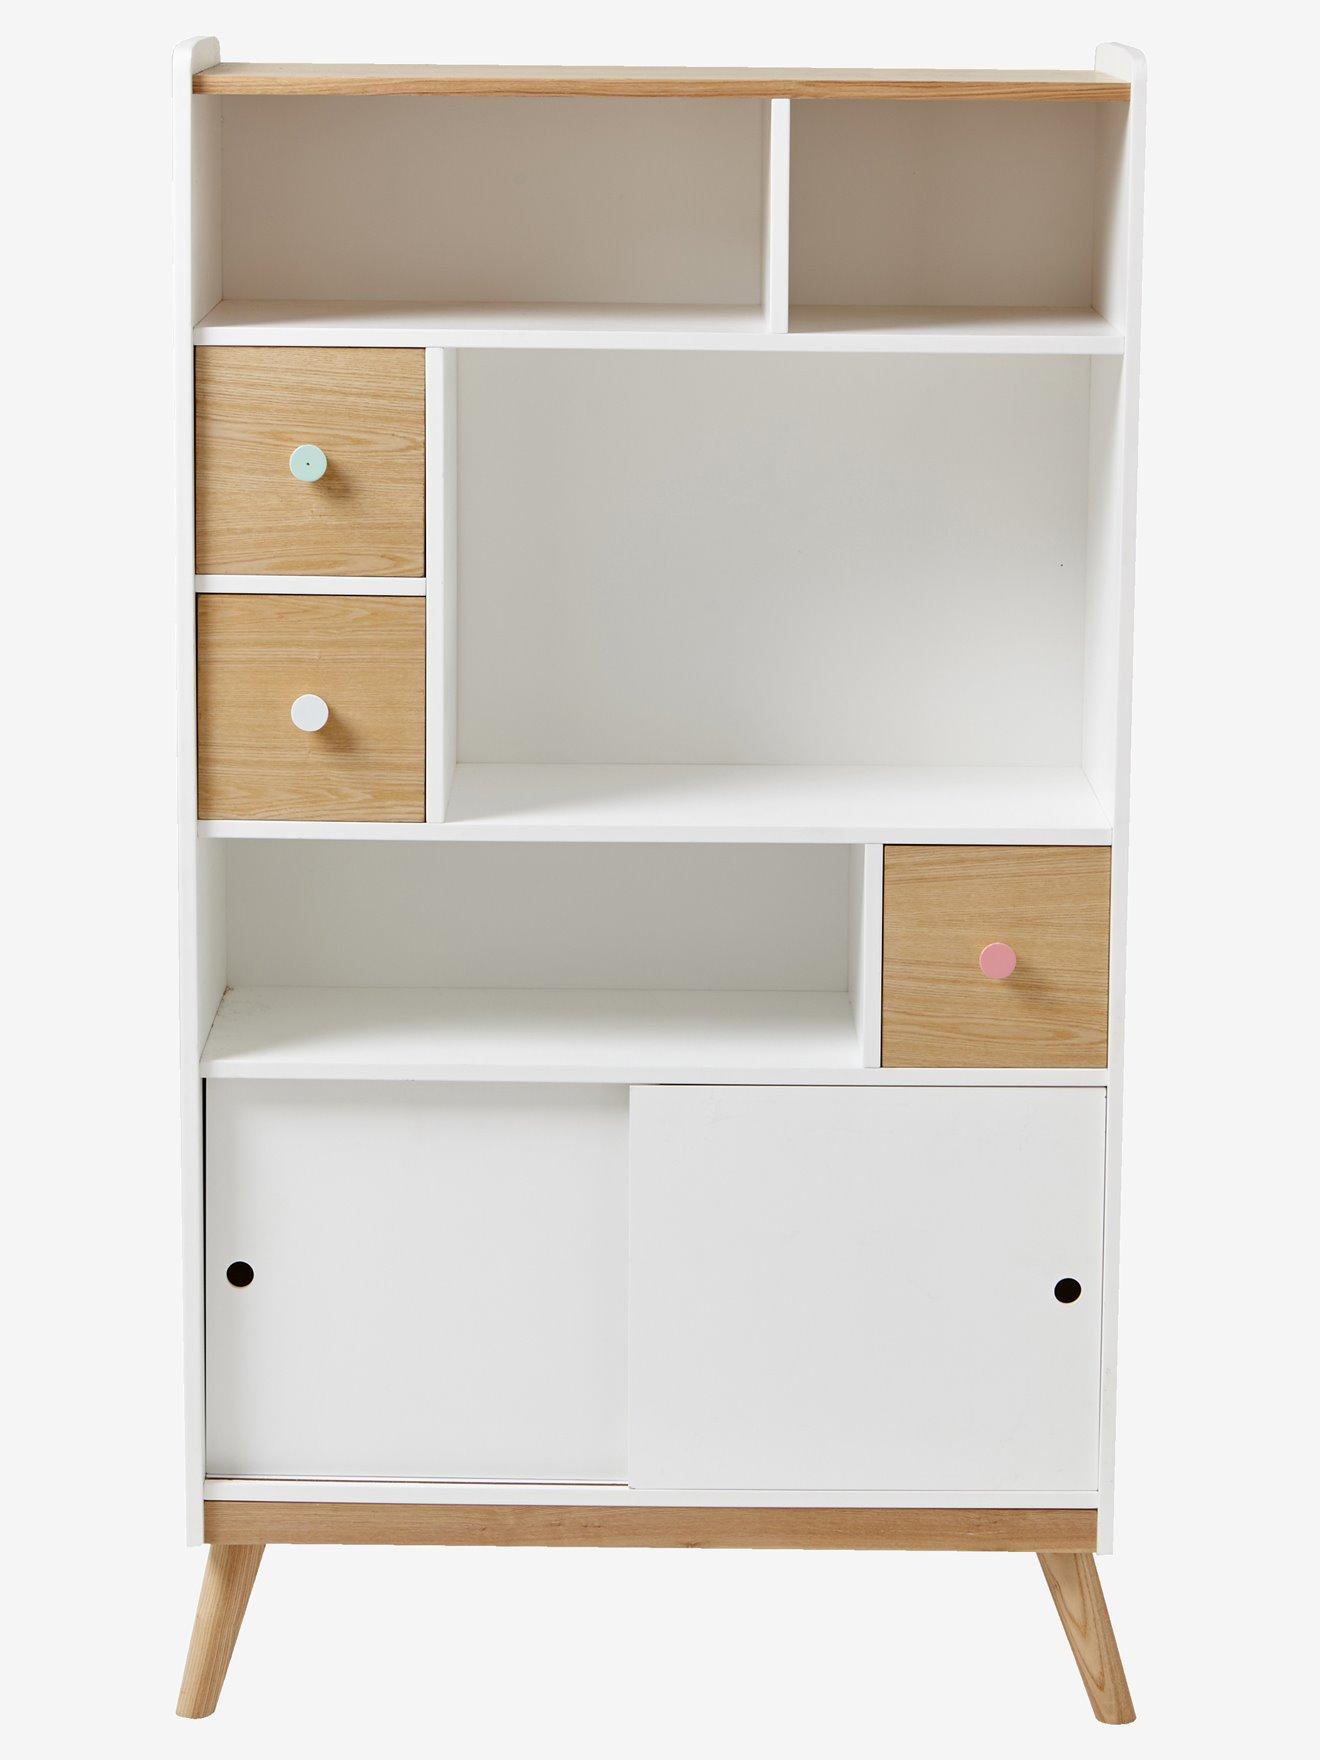 biblioth que enfant o trouver une biblioth que. Black Bedroom Furniture Sets. Home Design Ideas